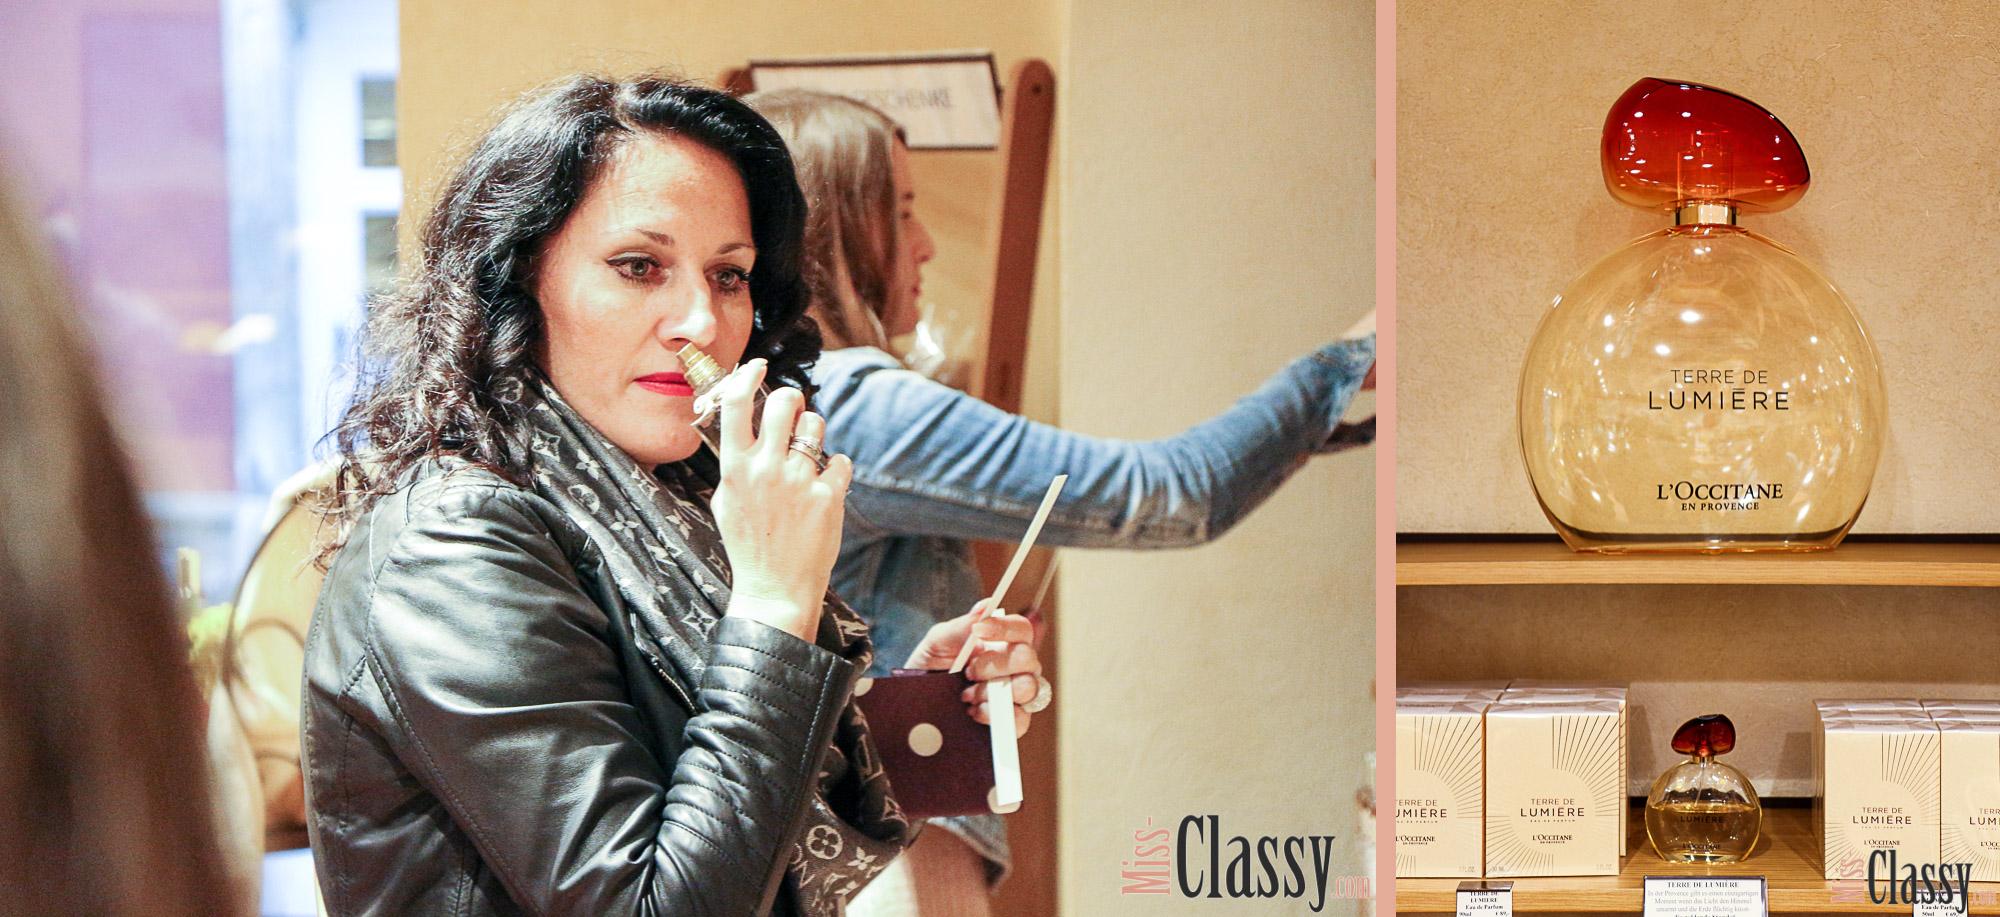 LIFESTYLE: L'Occitane en Provence feiert den 20. Geburtstag in Graz, Miss Classy, Lifestyle Blog, Beauty Blog, Graz, Steiermark, Österreich, classy, beclassy, Provence, Kosmetik, Parfum, Gesichtspflege, Store, Shop, Lavendel, Bloggerevent, Miss Classy, Doris, Terre de Lumière